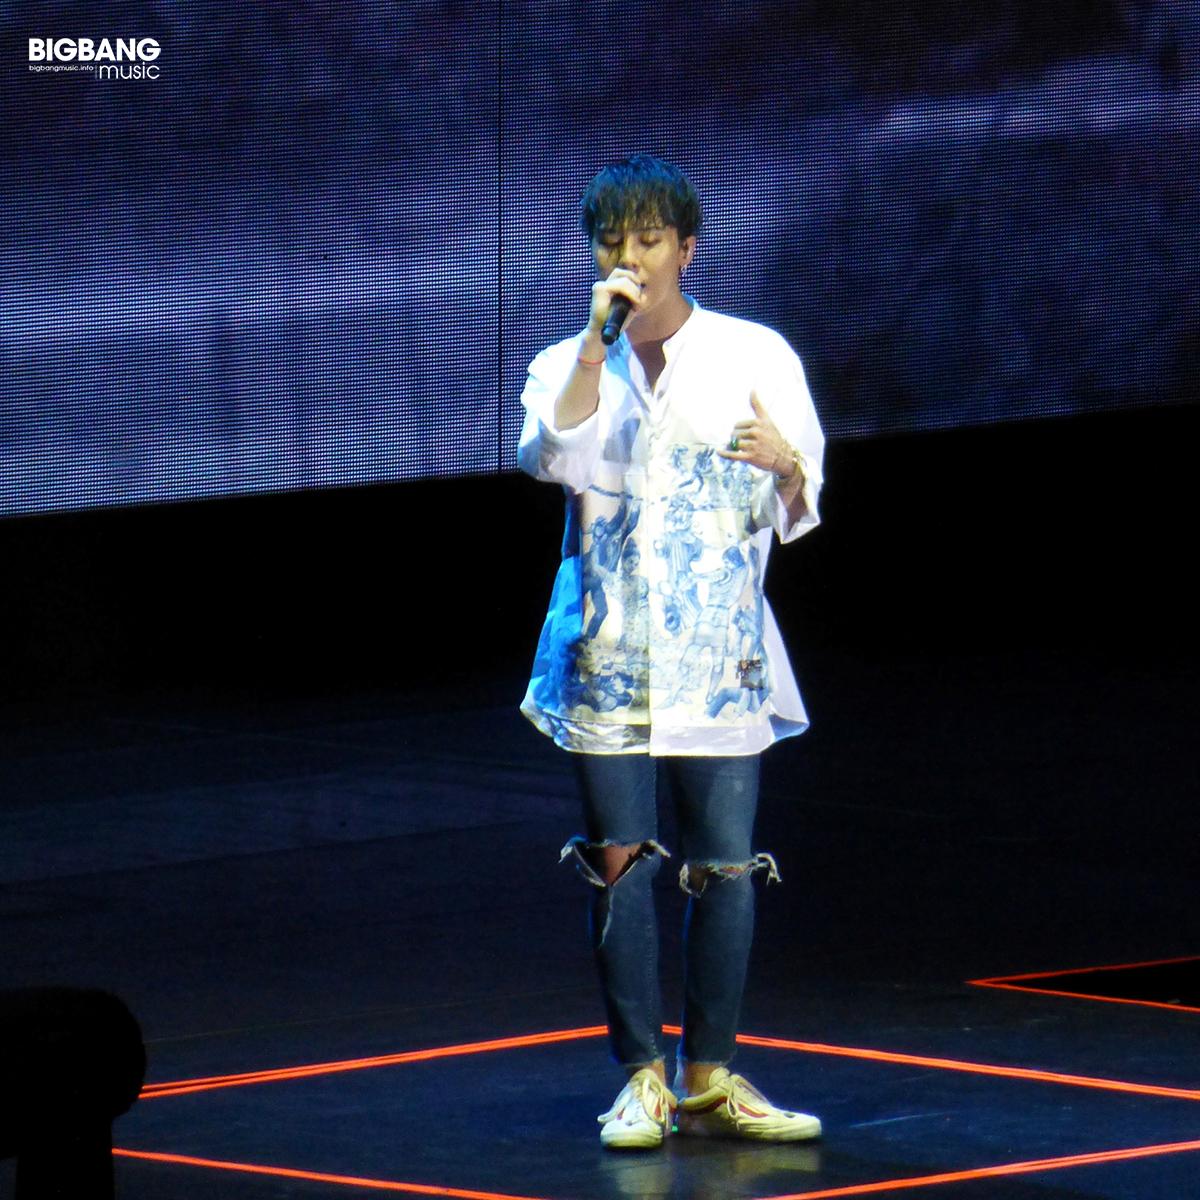 BIGBANGmusic-BIGBANG-FM-Hong-Kong-Day-2-2016-07-23-24